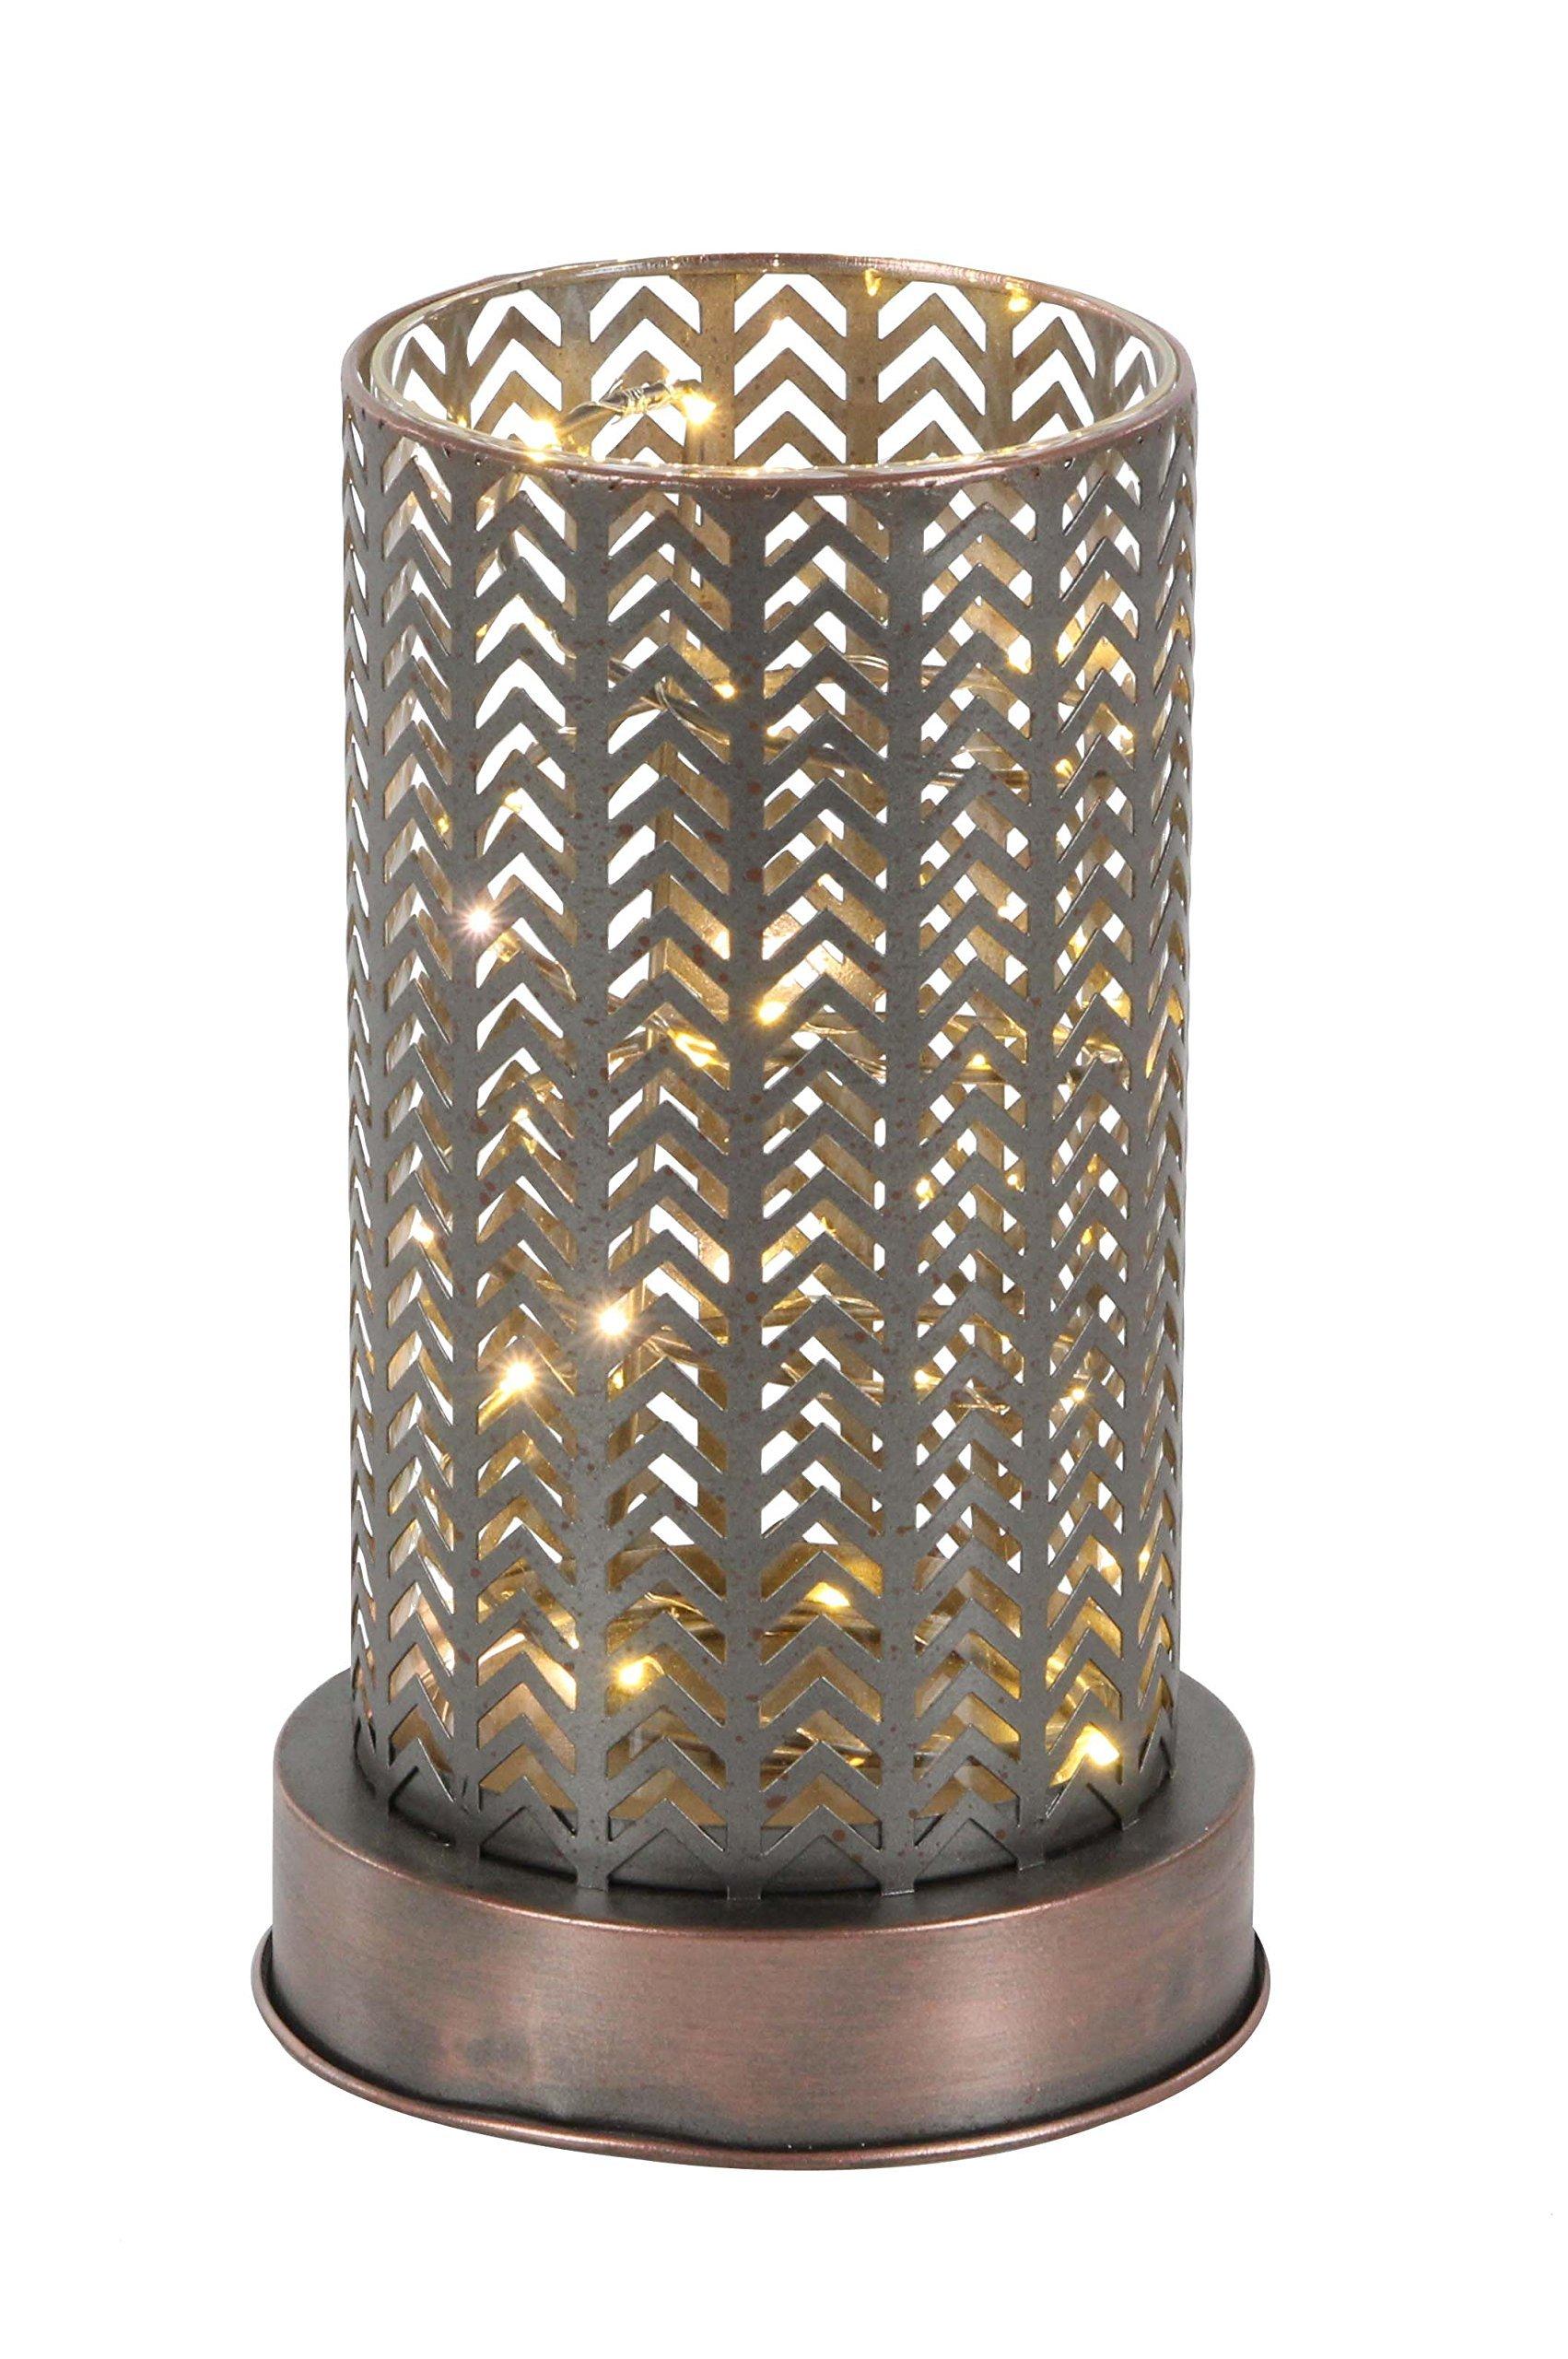 Deco 79 94642 Bronze Iron Chevron-Patterned LED Lantern, 10'' x 6'', by Deco 79